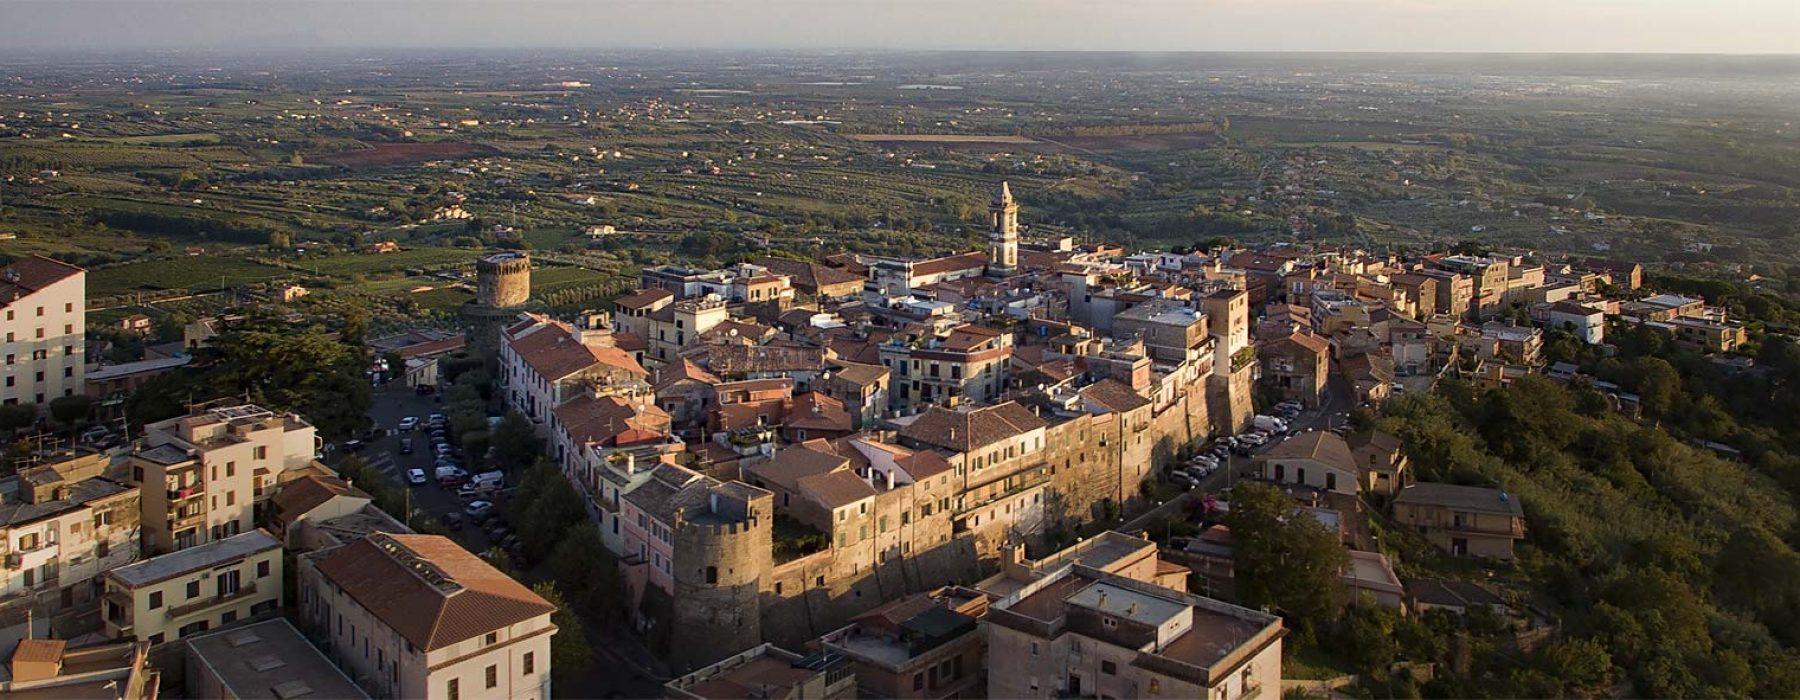 Lanuvio,罗马城堡的明珠,在历史和传奇之间